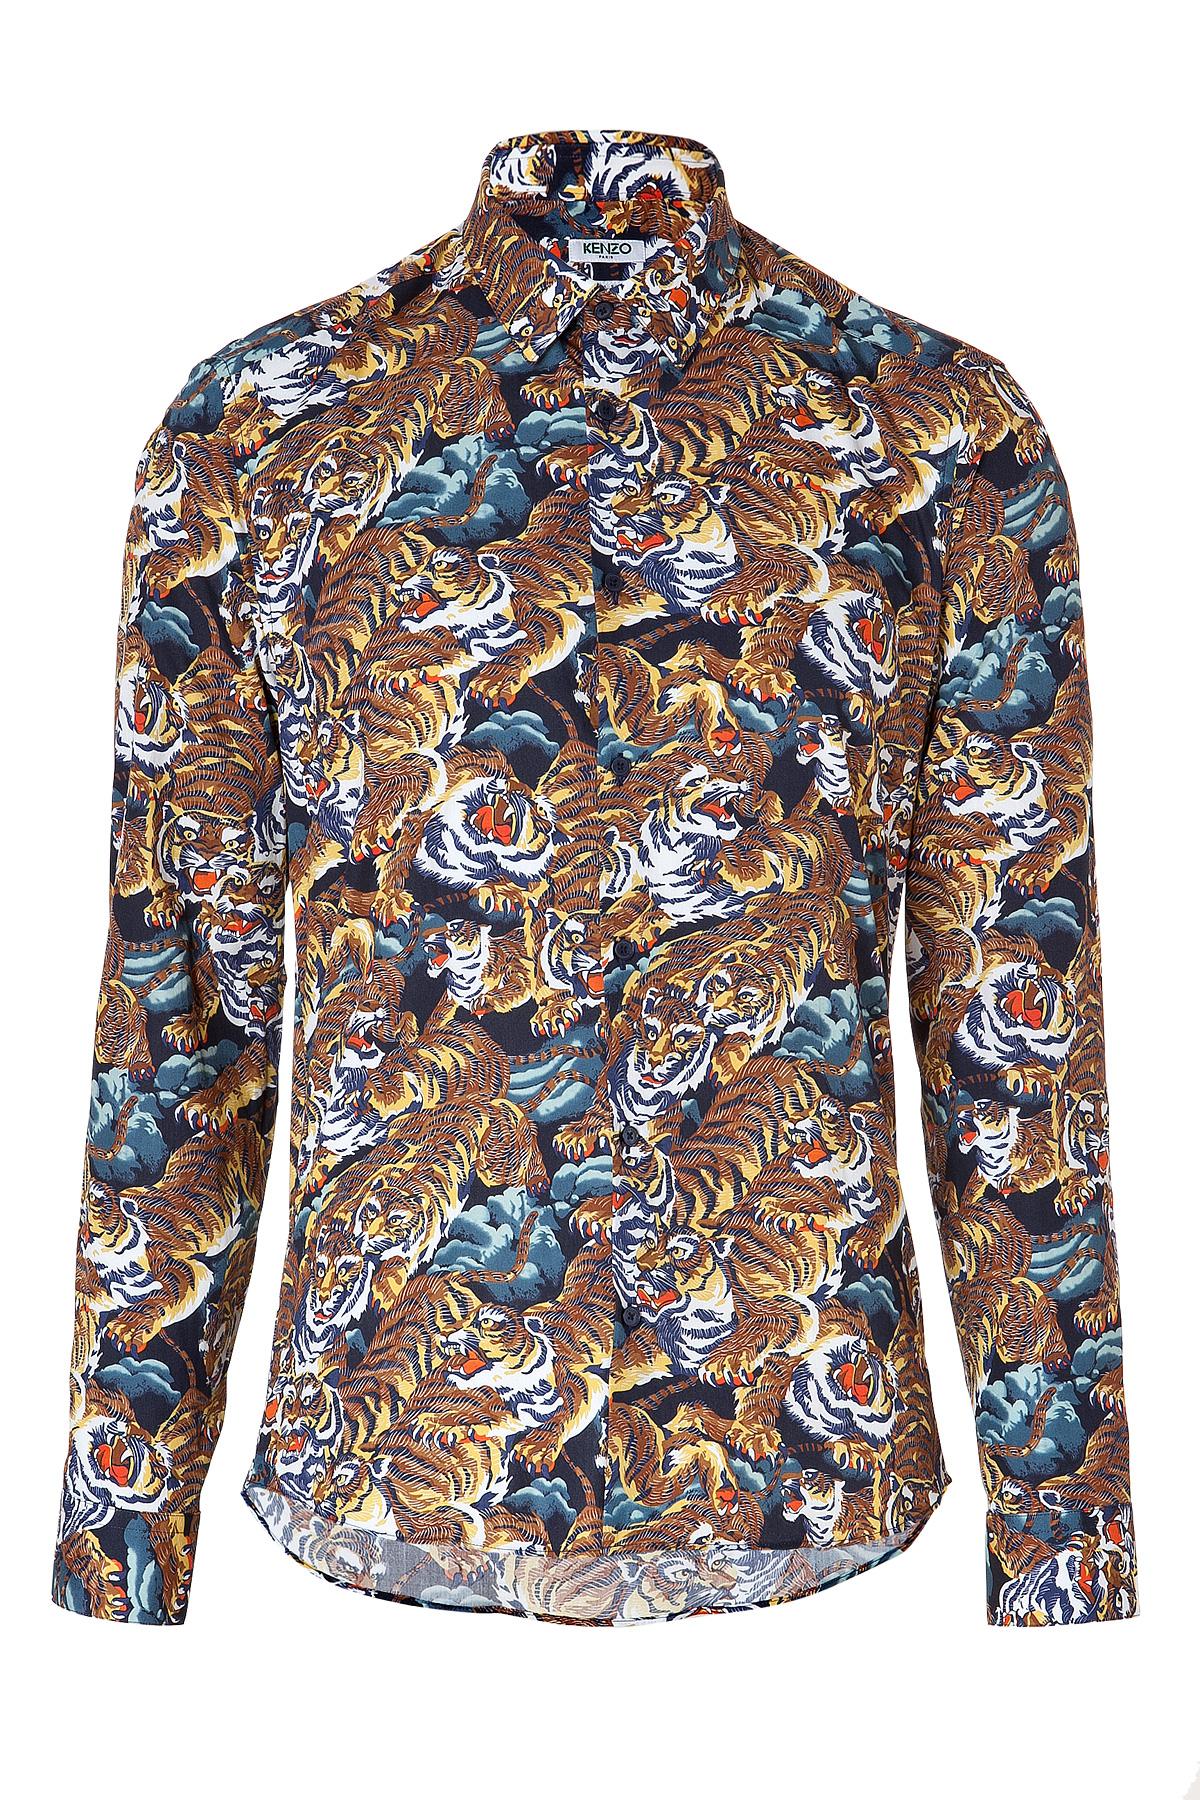 Cotton Shirt Lyst Print Kenzo Men Tiger For xqqw0pT6